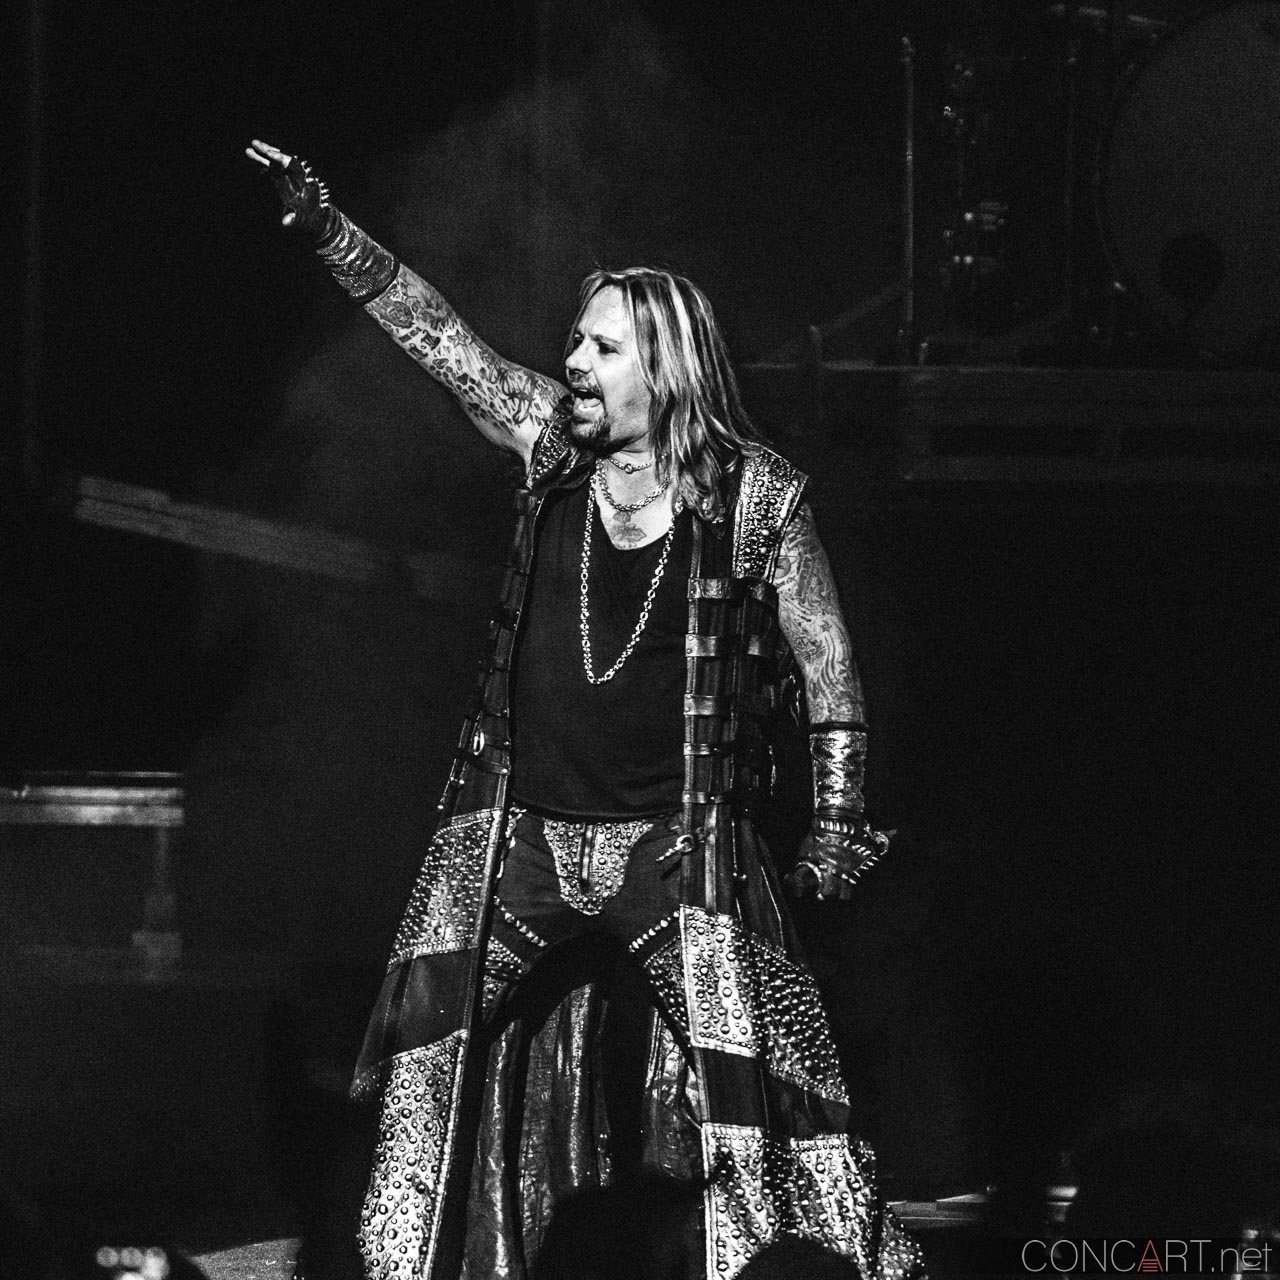 Mötley Crüe photo by Sean Molin 5